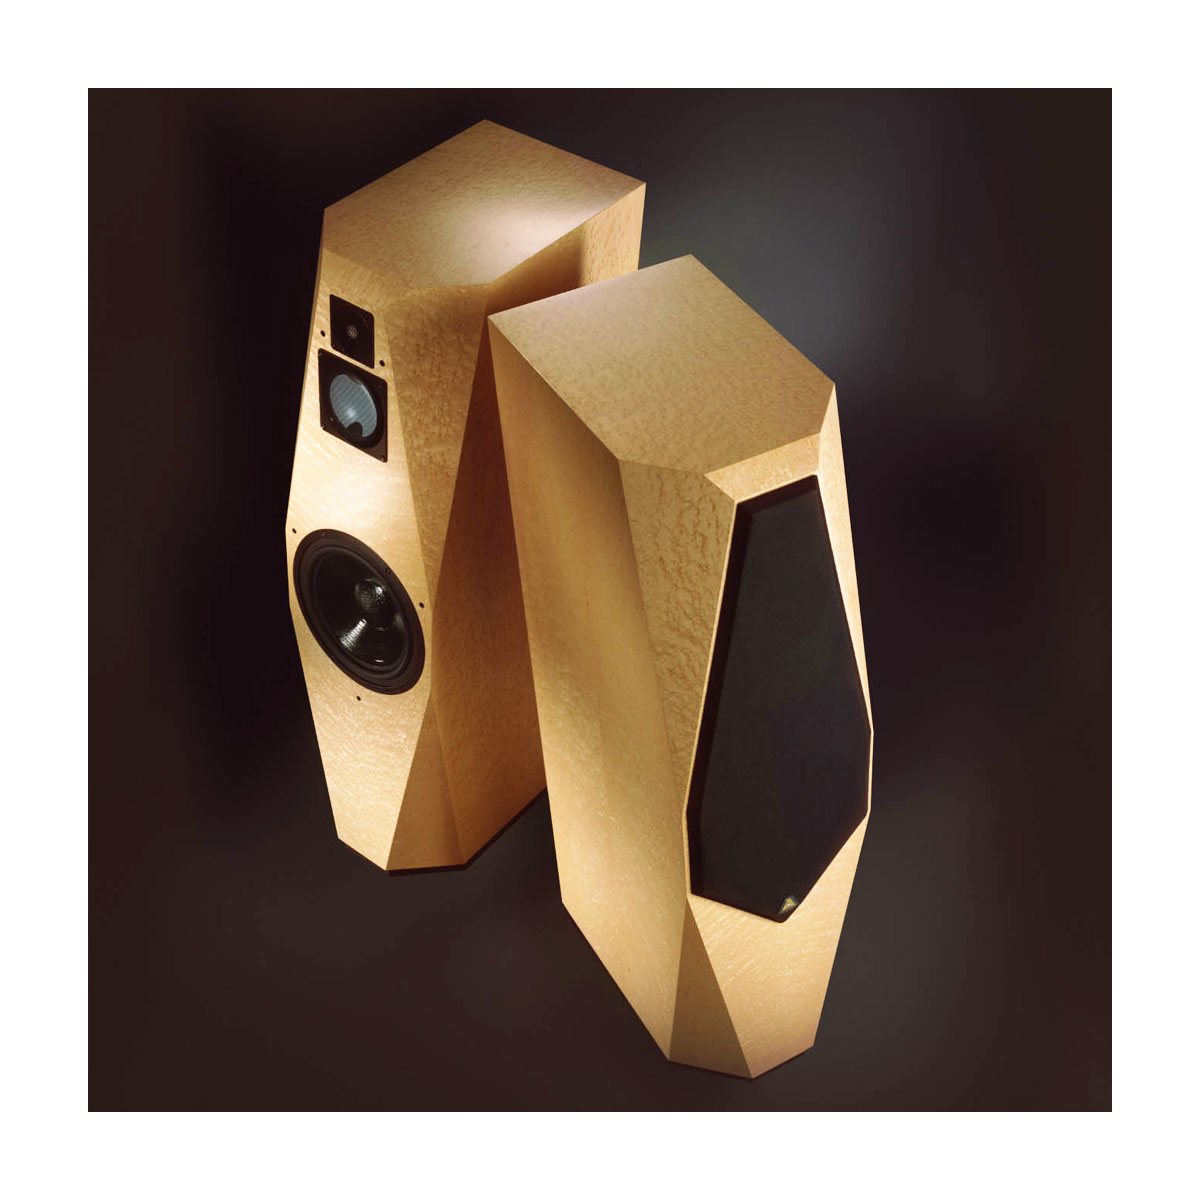 Avalon Acoustics Diamond Maple 特別価格ASK! アヴァロン スピーカーシステム ペア